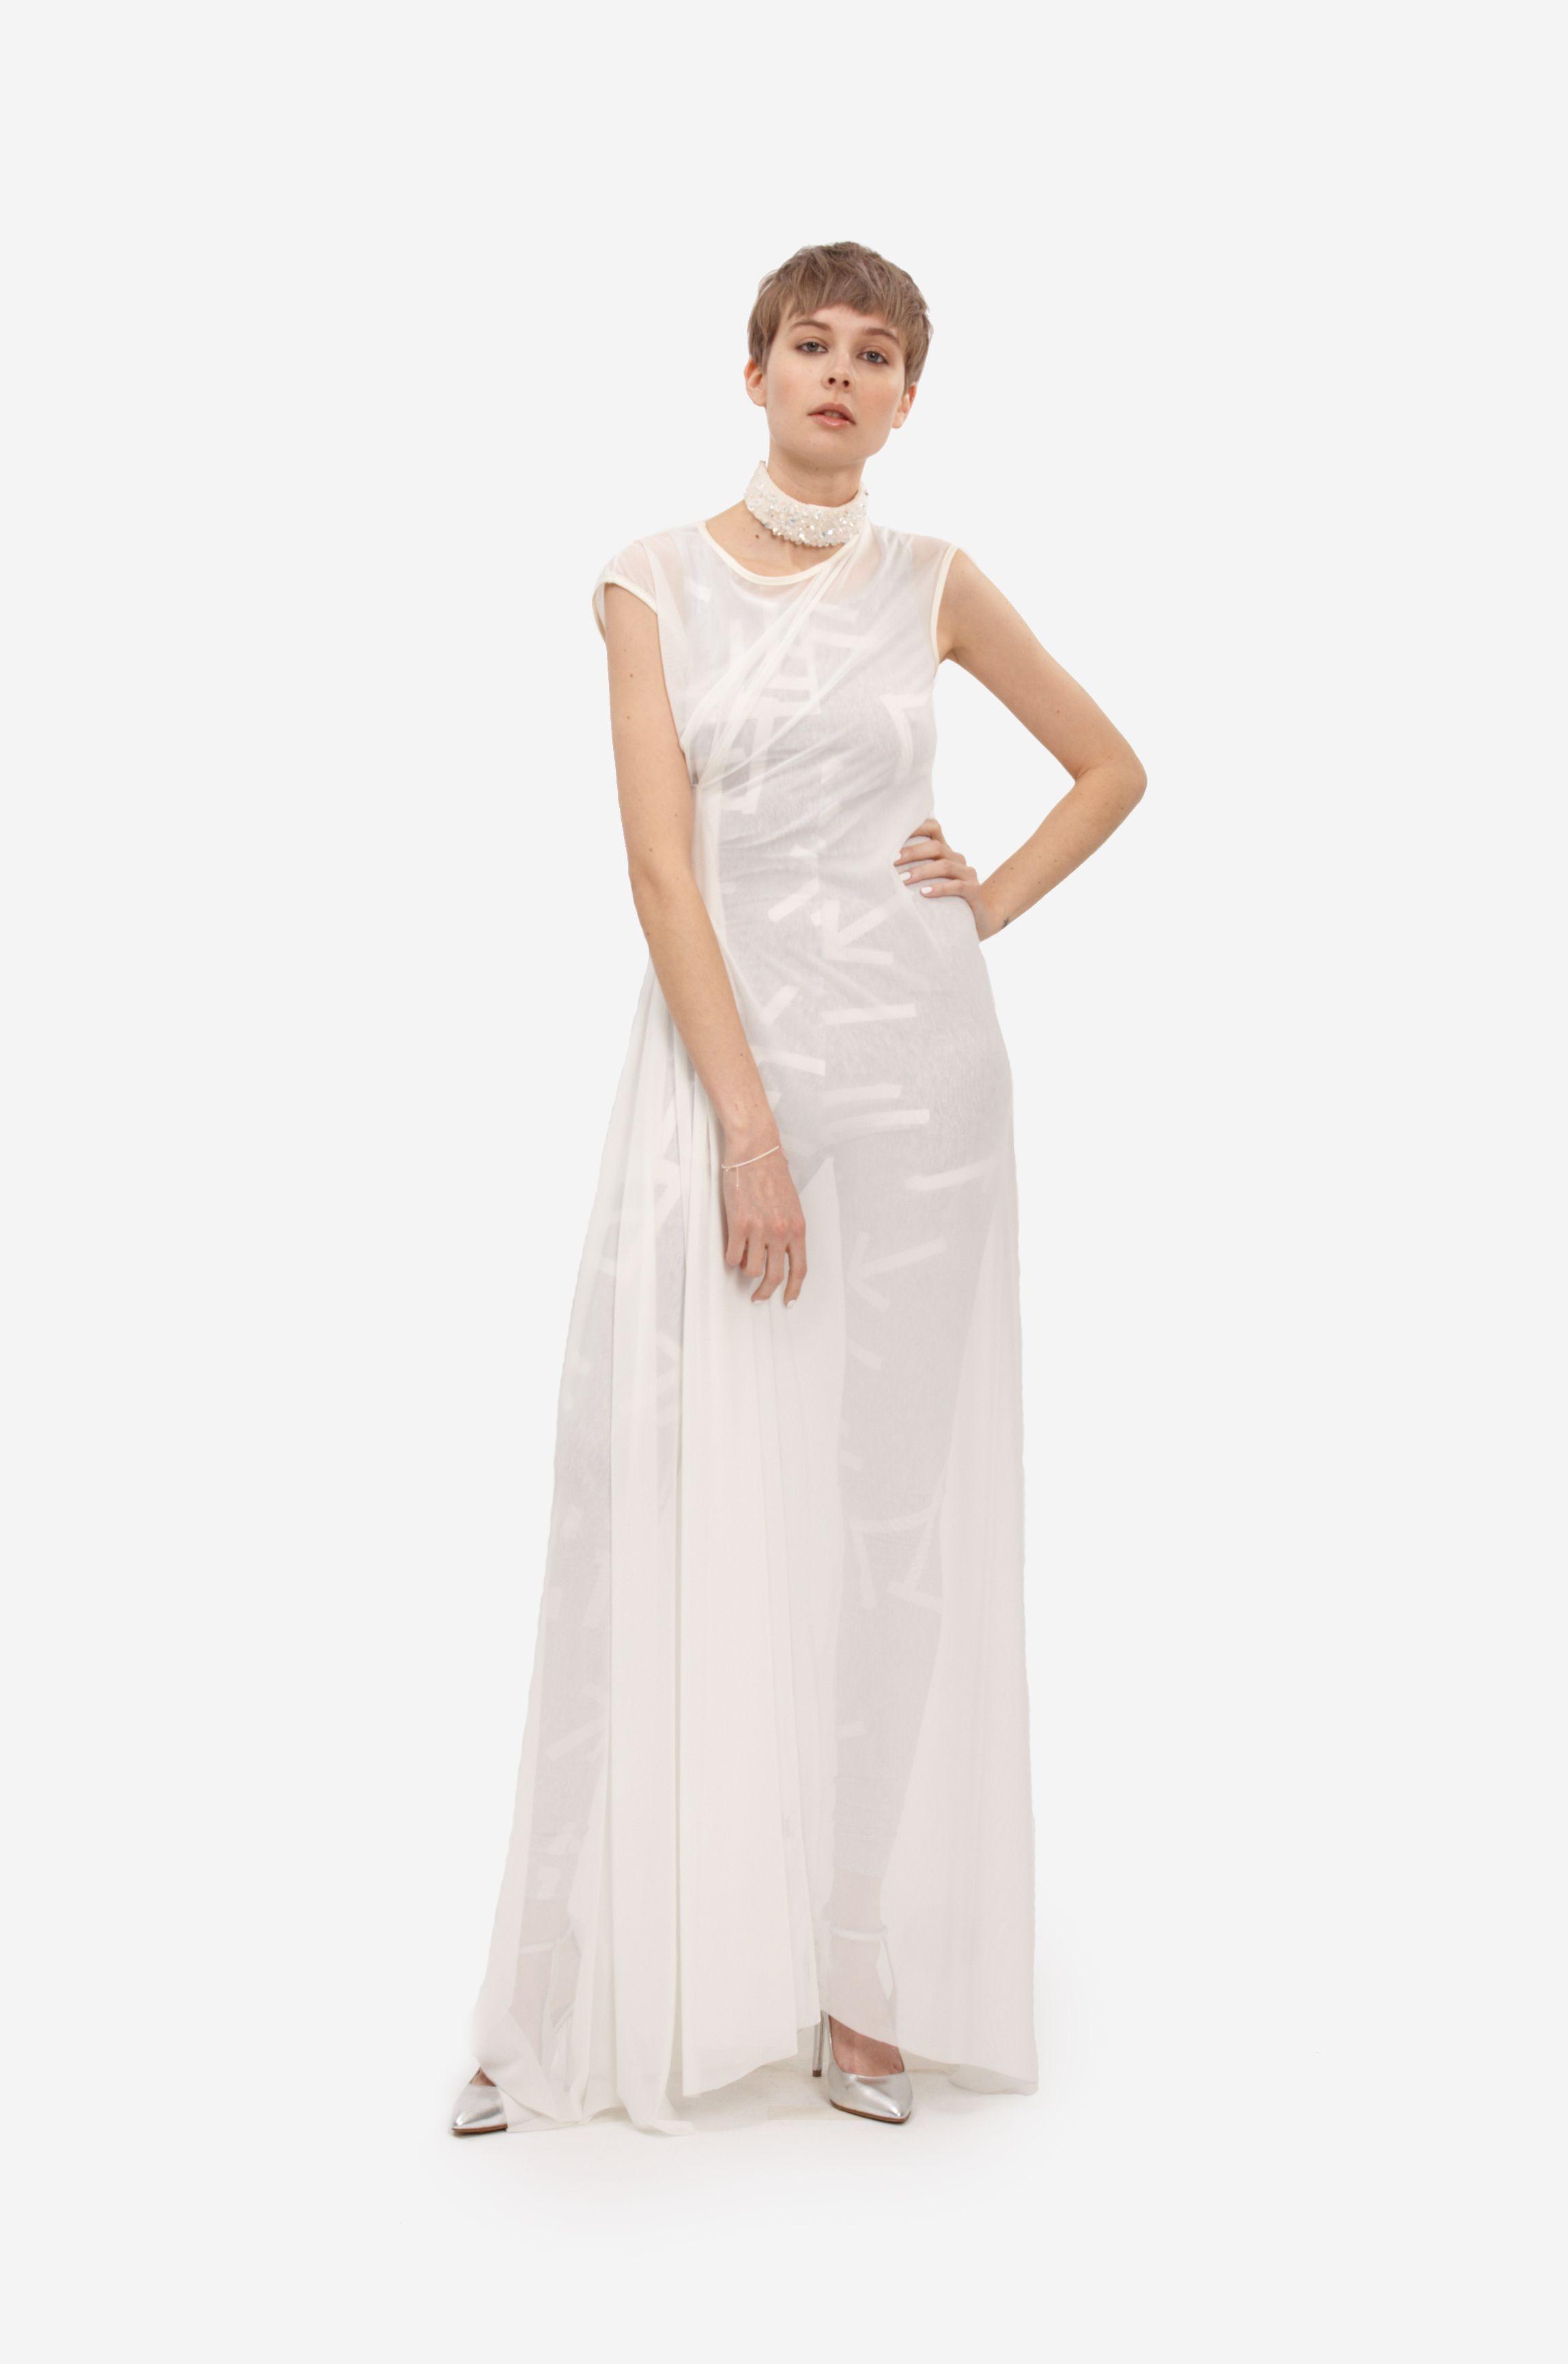 45+ One sided wedding dress inspirations